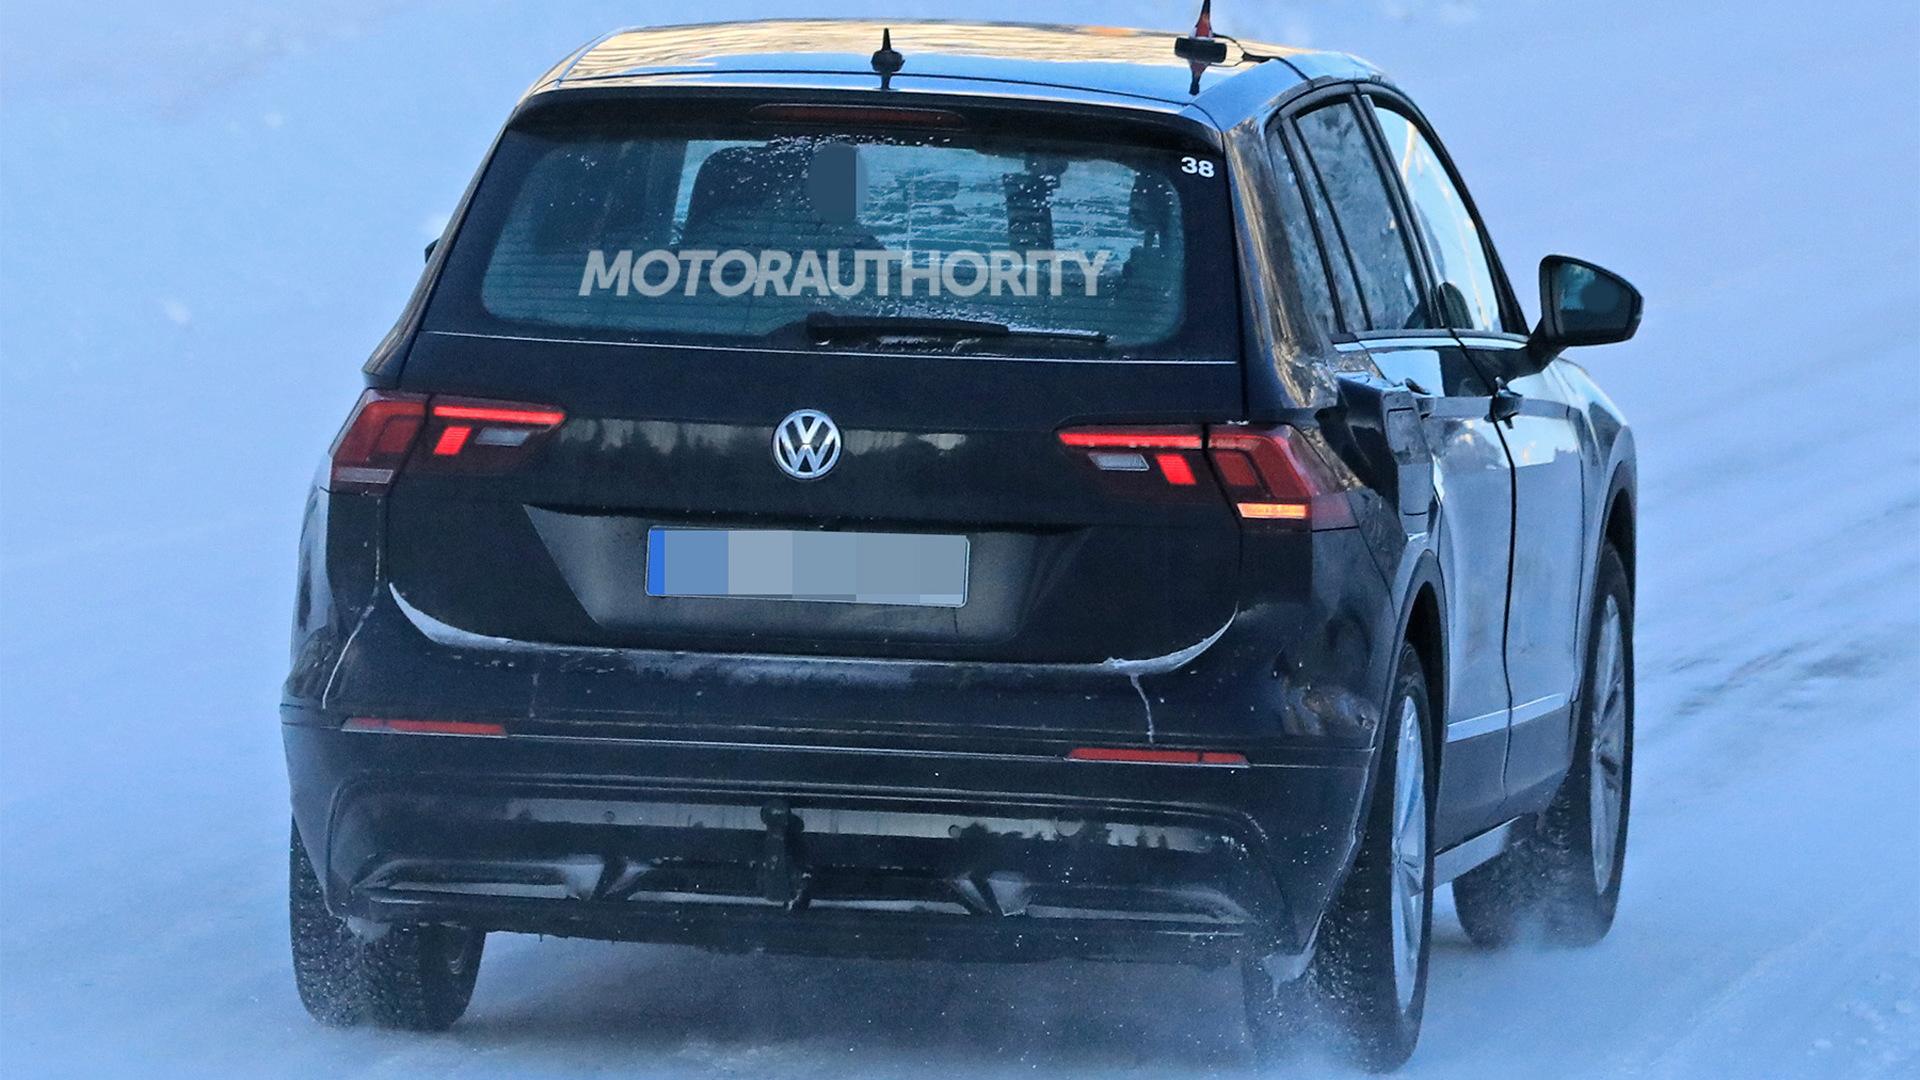 2021 Volkswagen ID Crozz test mule spy shots - Image via S. Baldauf/SB-Medien